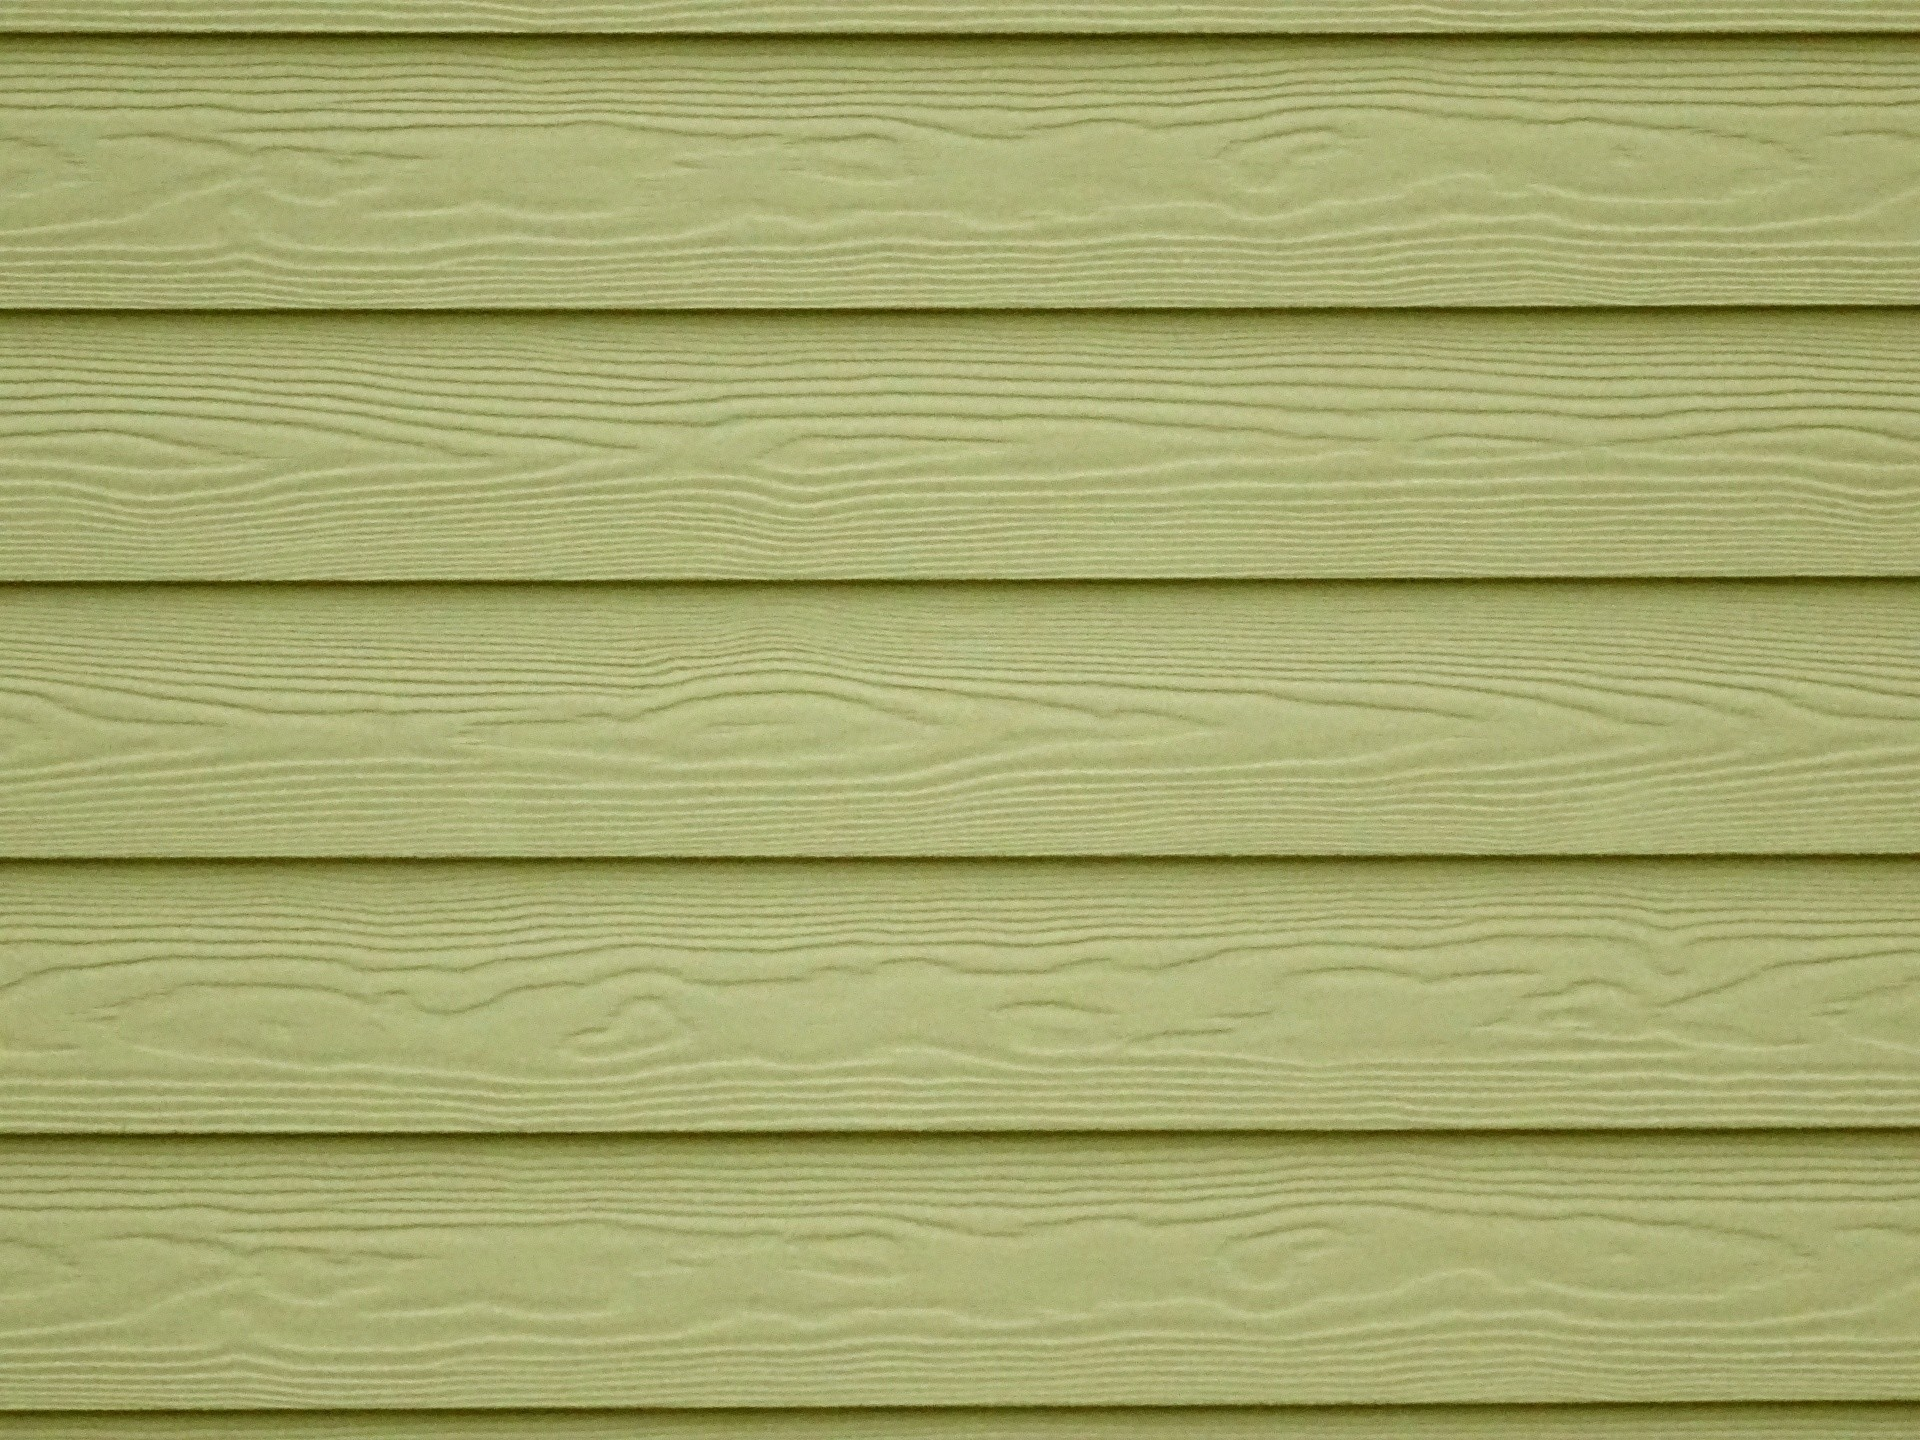 Res: 1920x1440, Olive Green Wood Texture Wallpaper